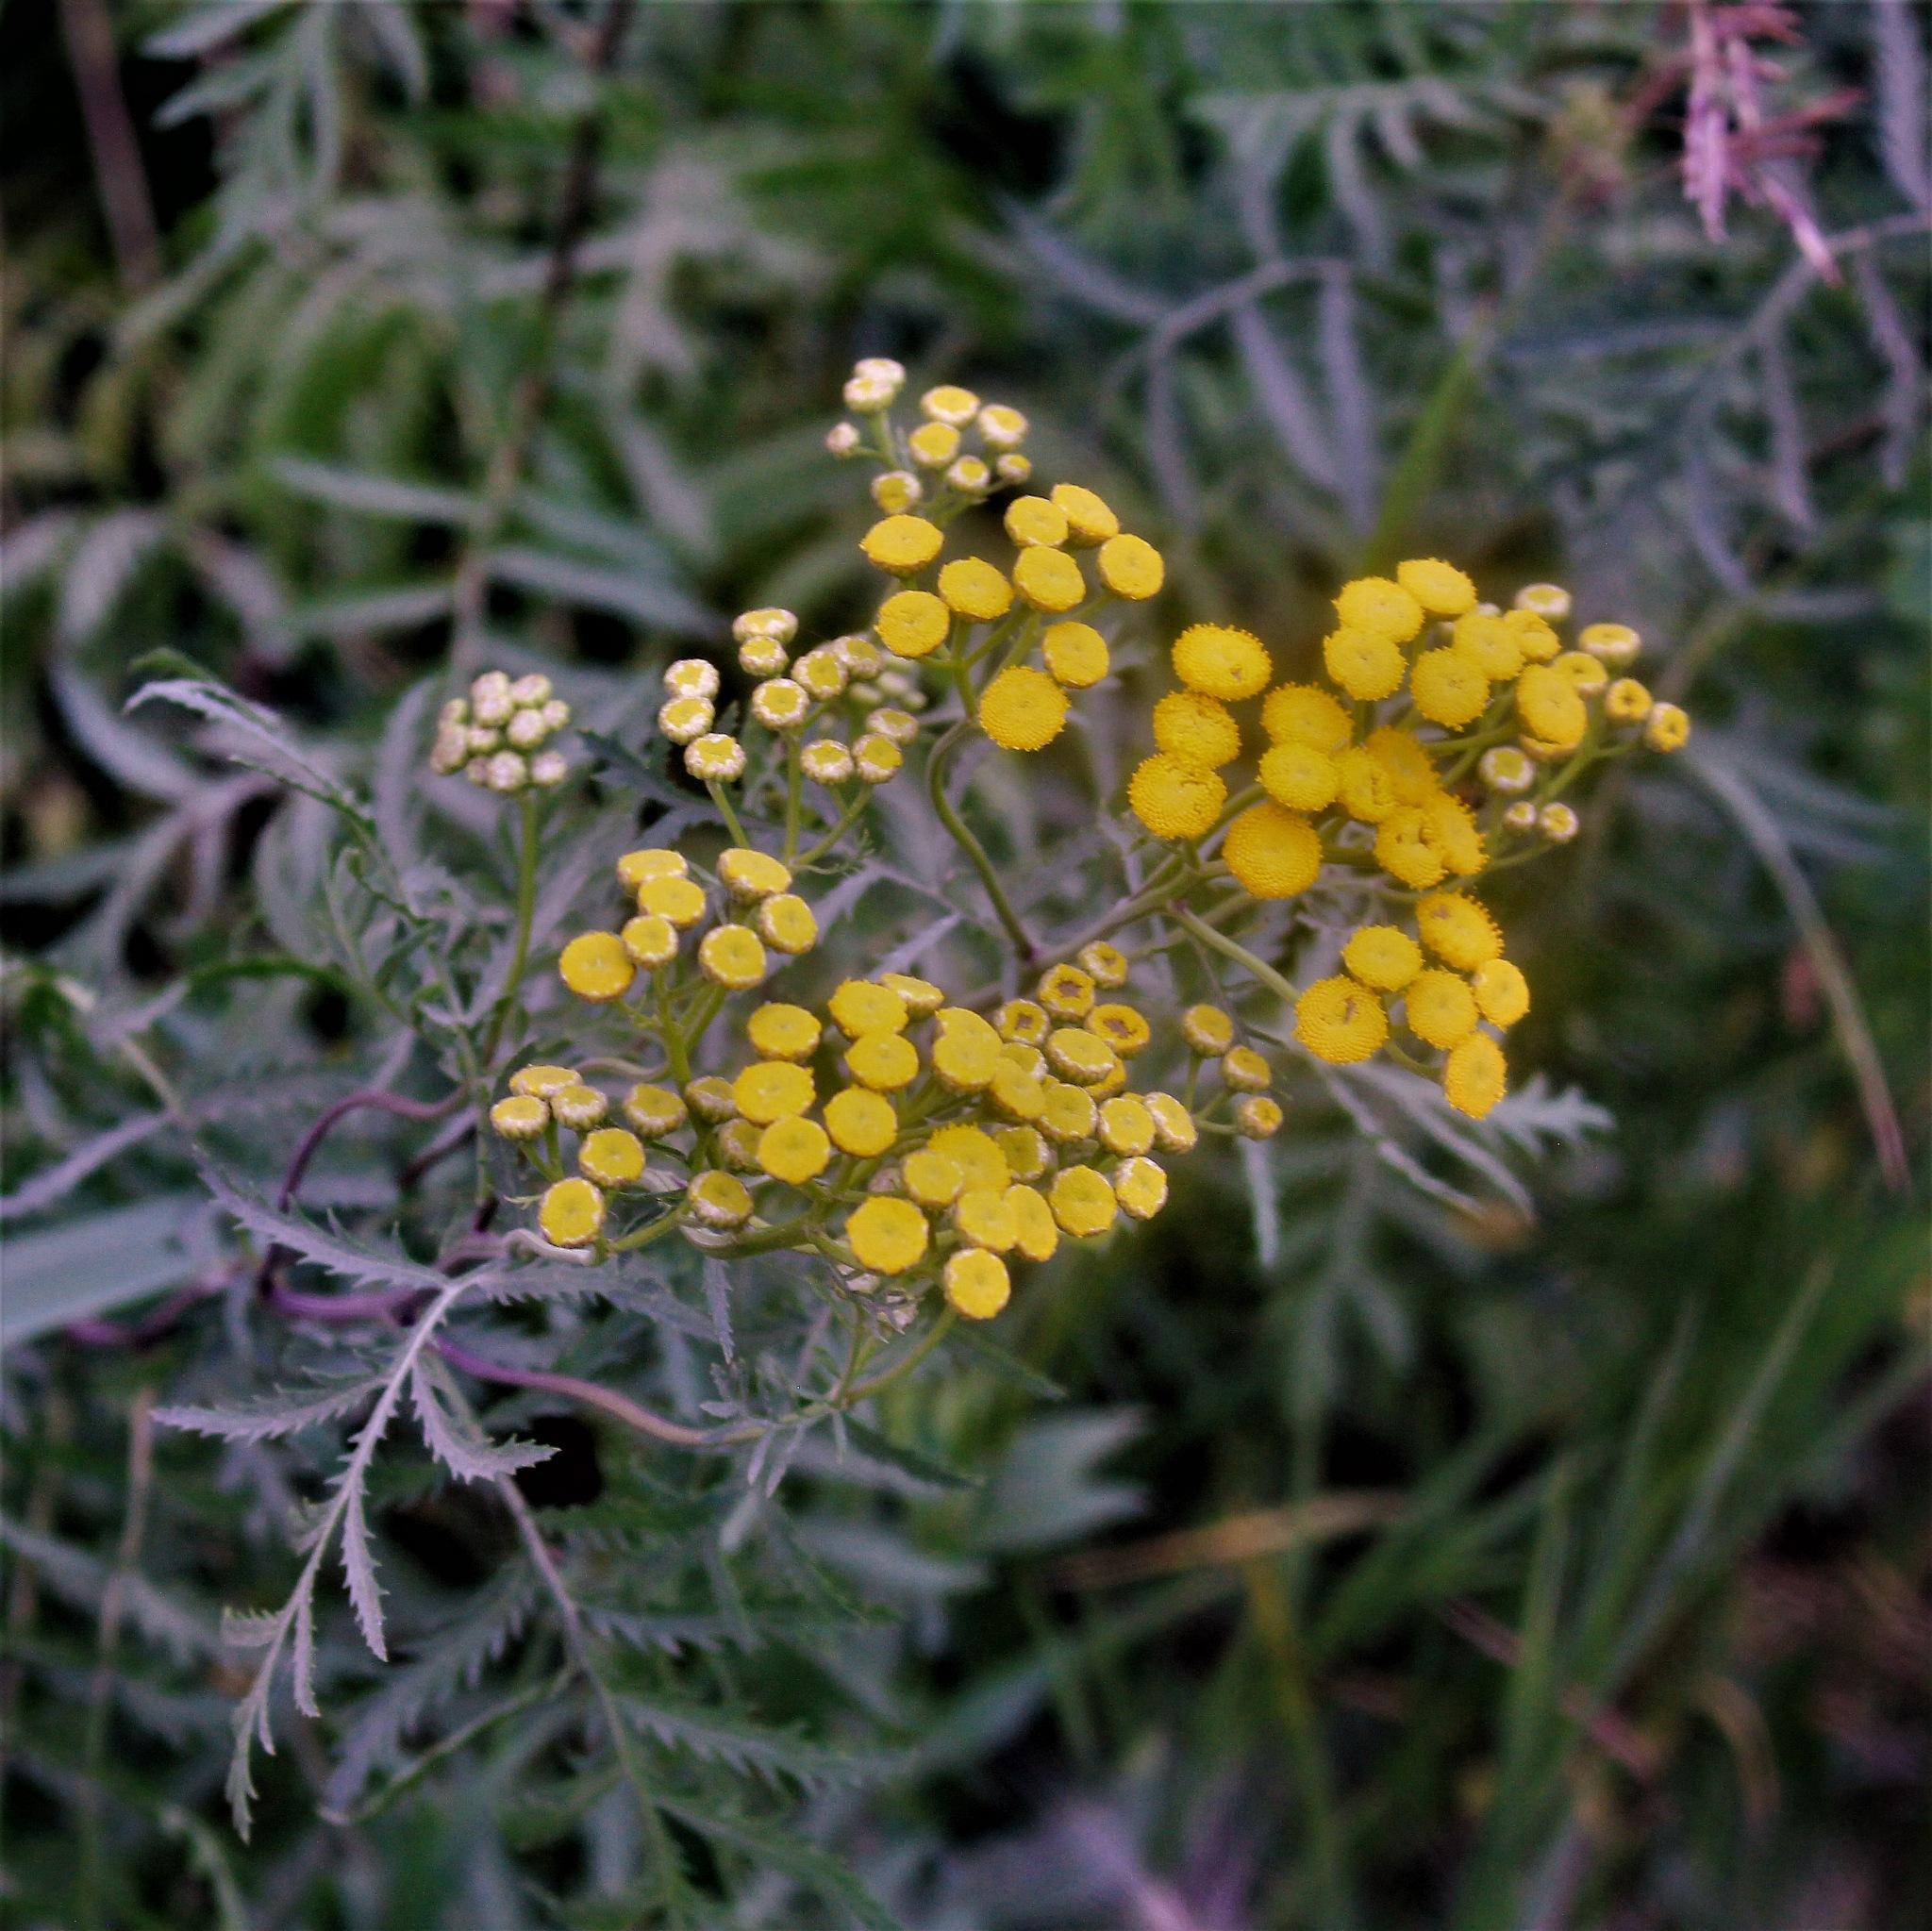 Wildflowers by David Imrie